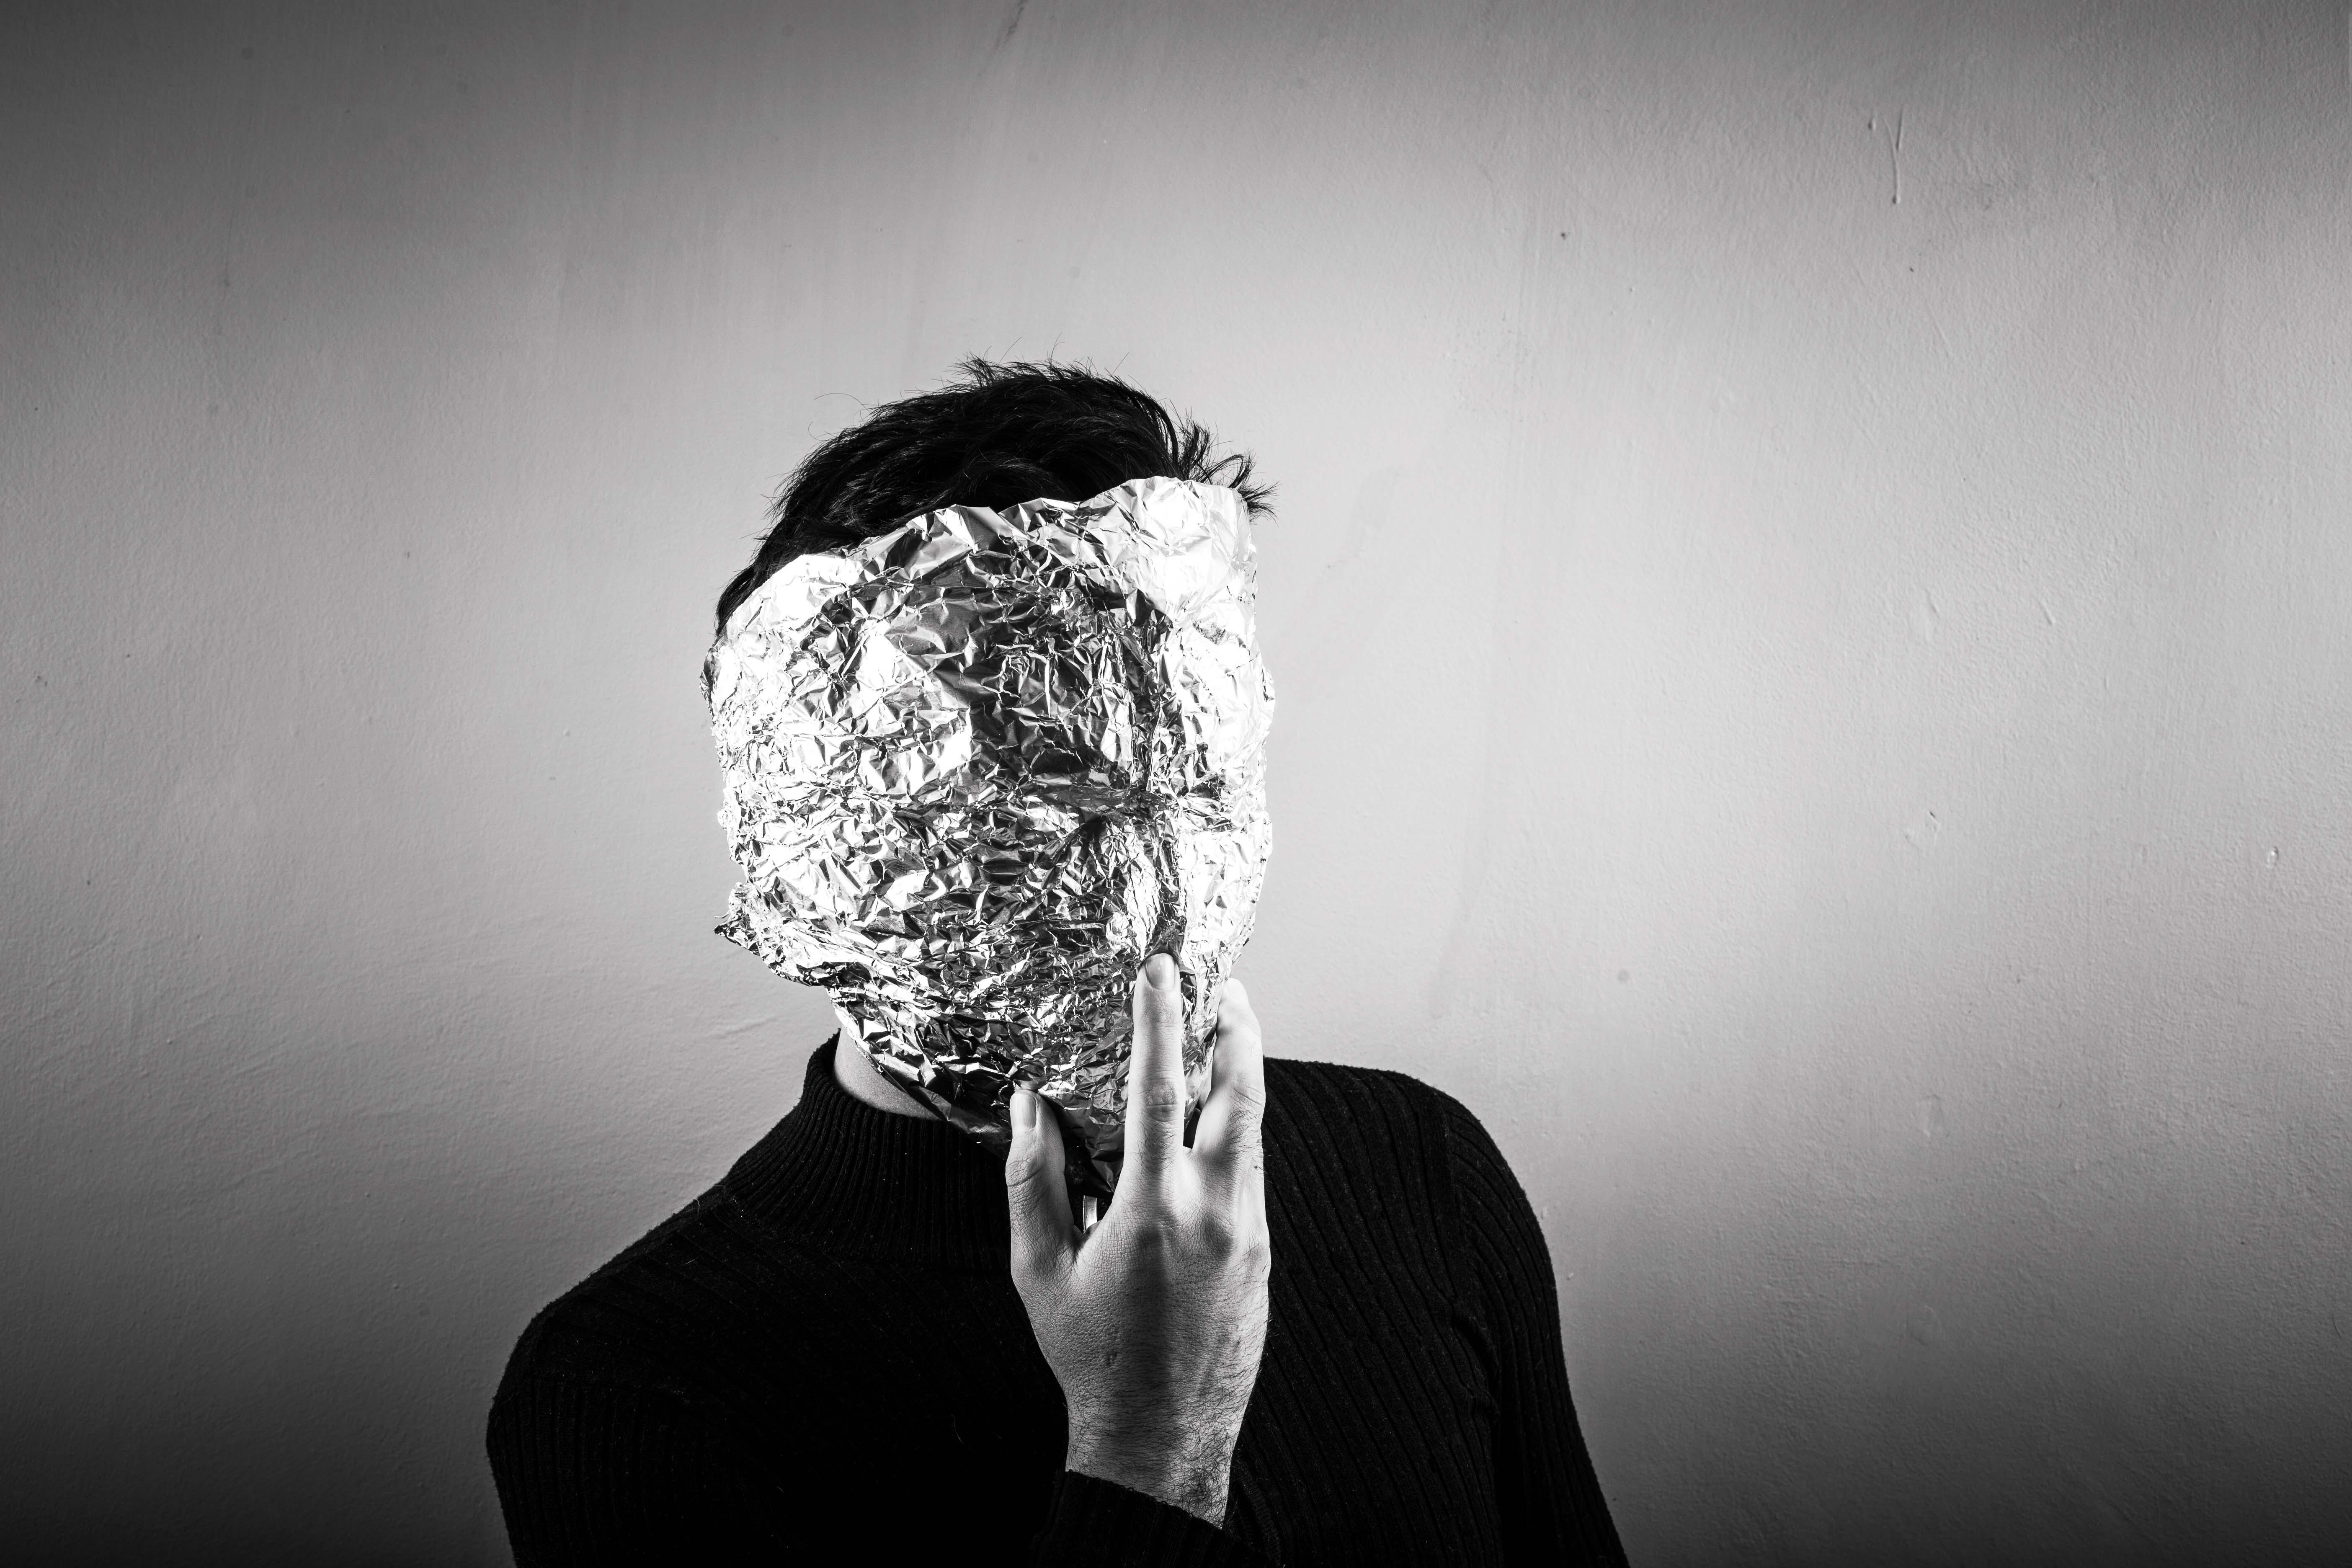 Aluminum-Mask-Photo-via-SplitShire-low